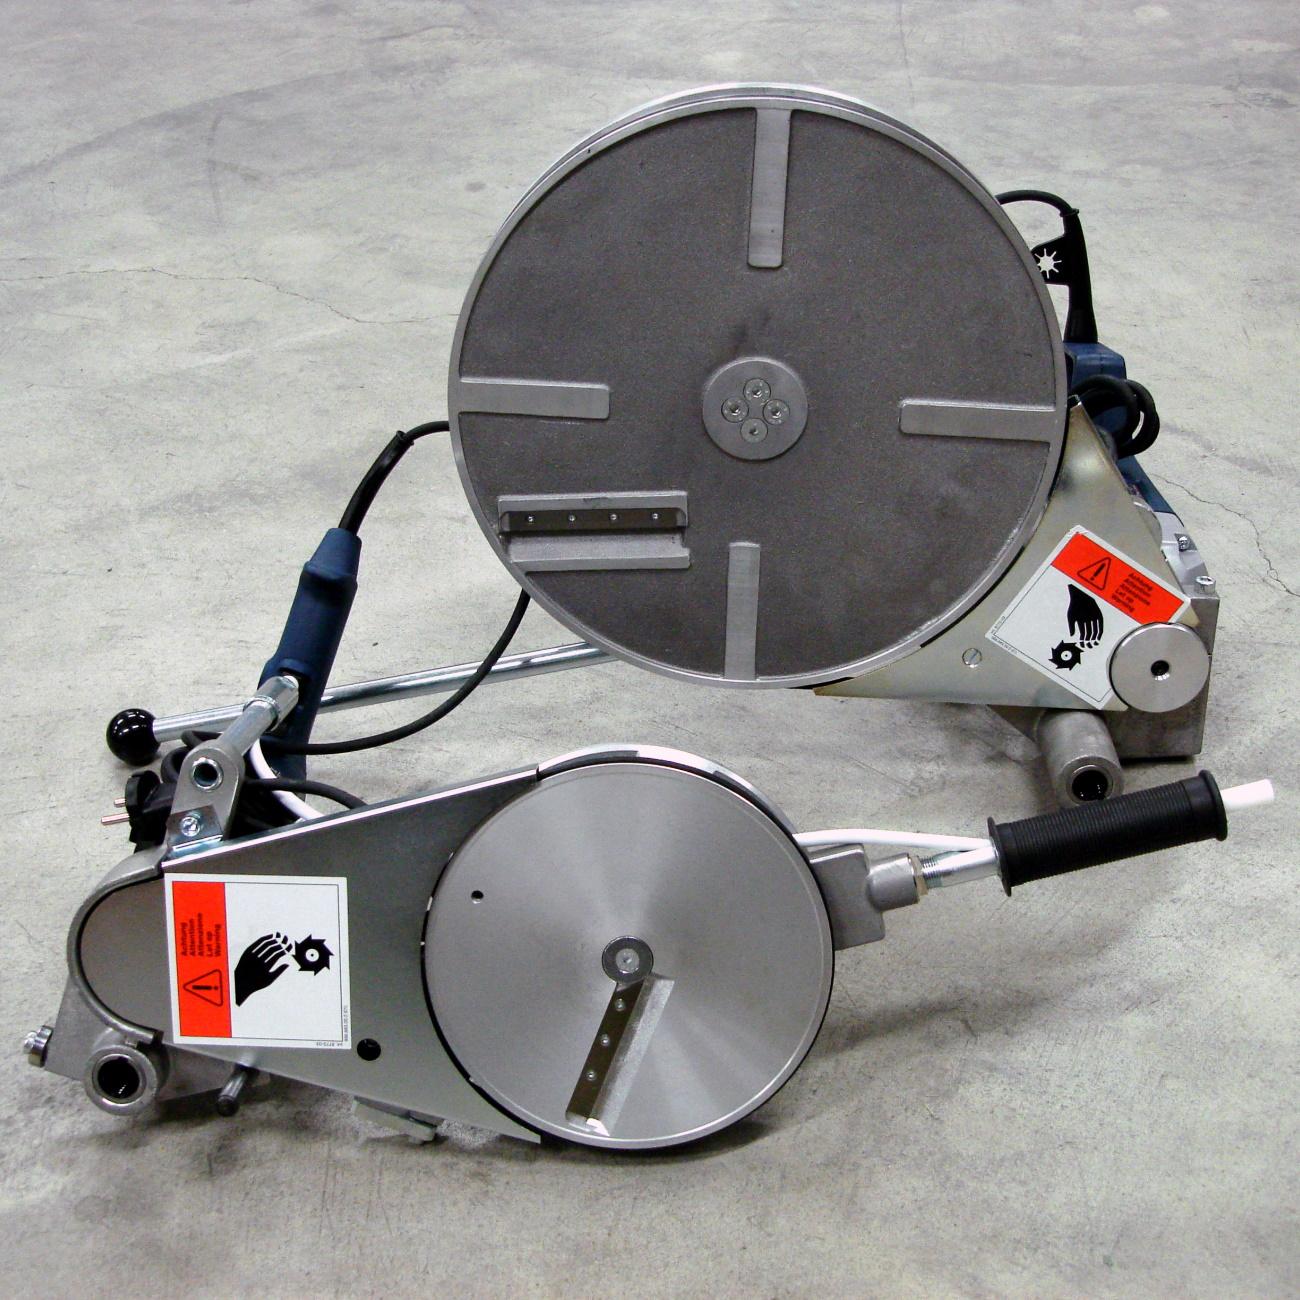 Komplettsystem - Högg AG Produktionstechnik